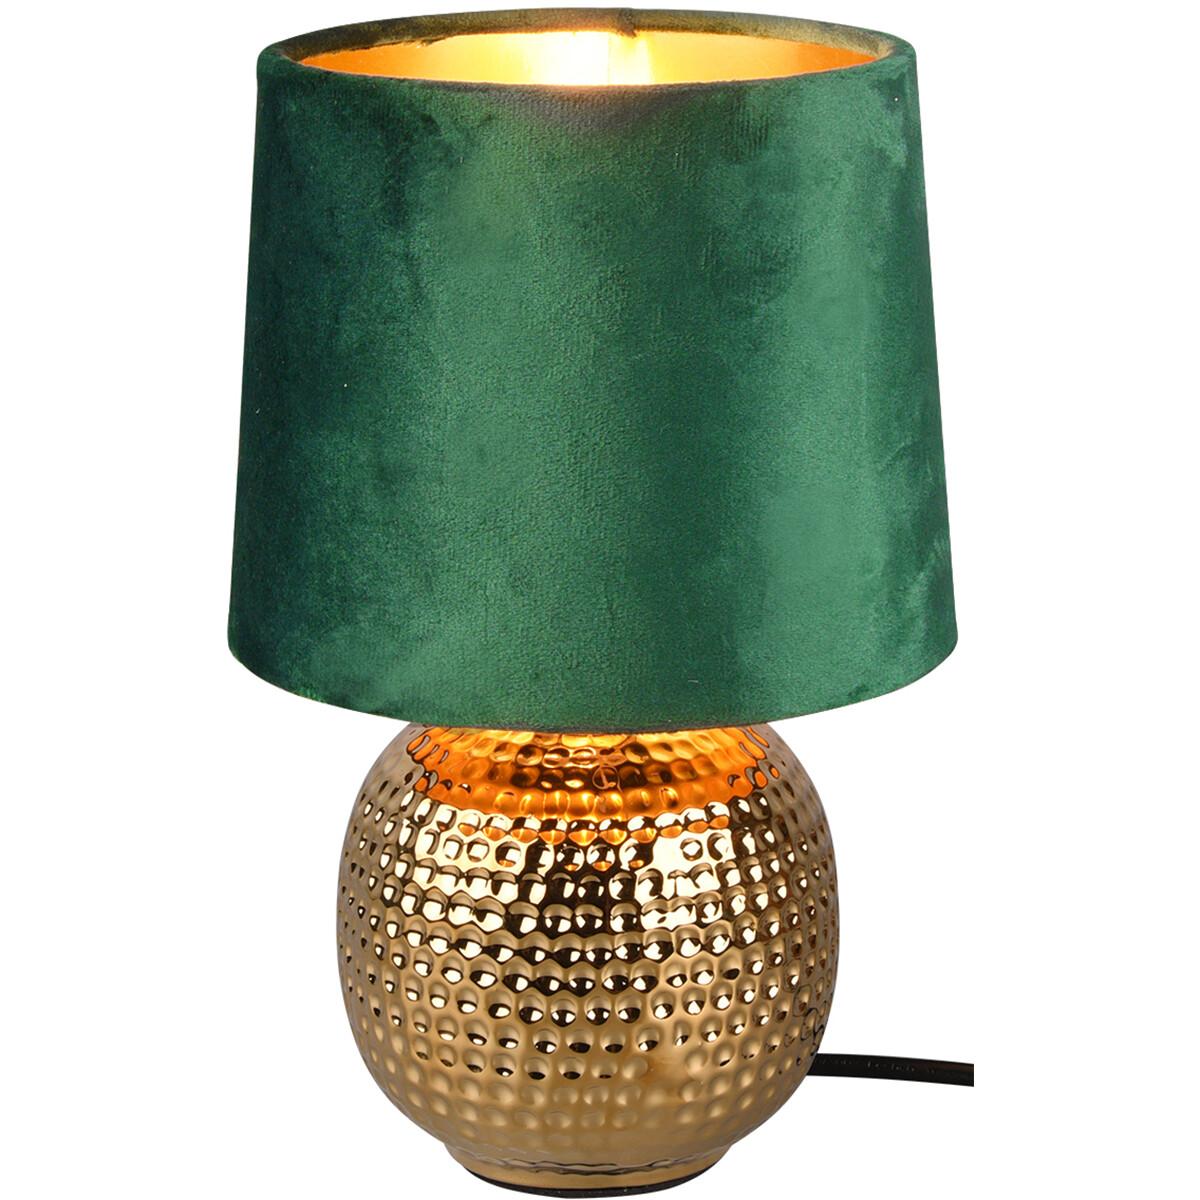 LED Tafellamp - Trion Sofia - E14 Fitting - Rond - Mat Groen - Keramiek